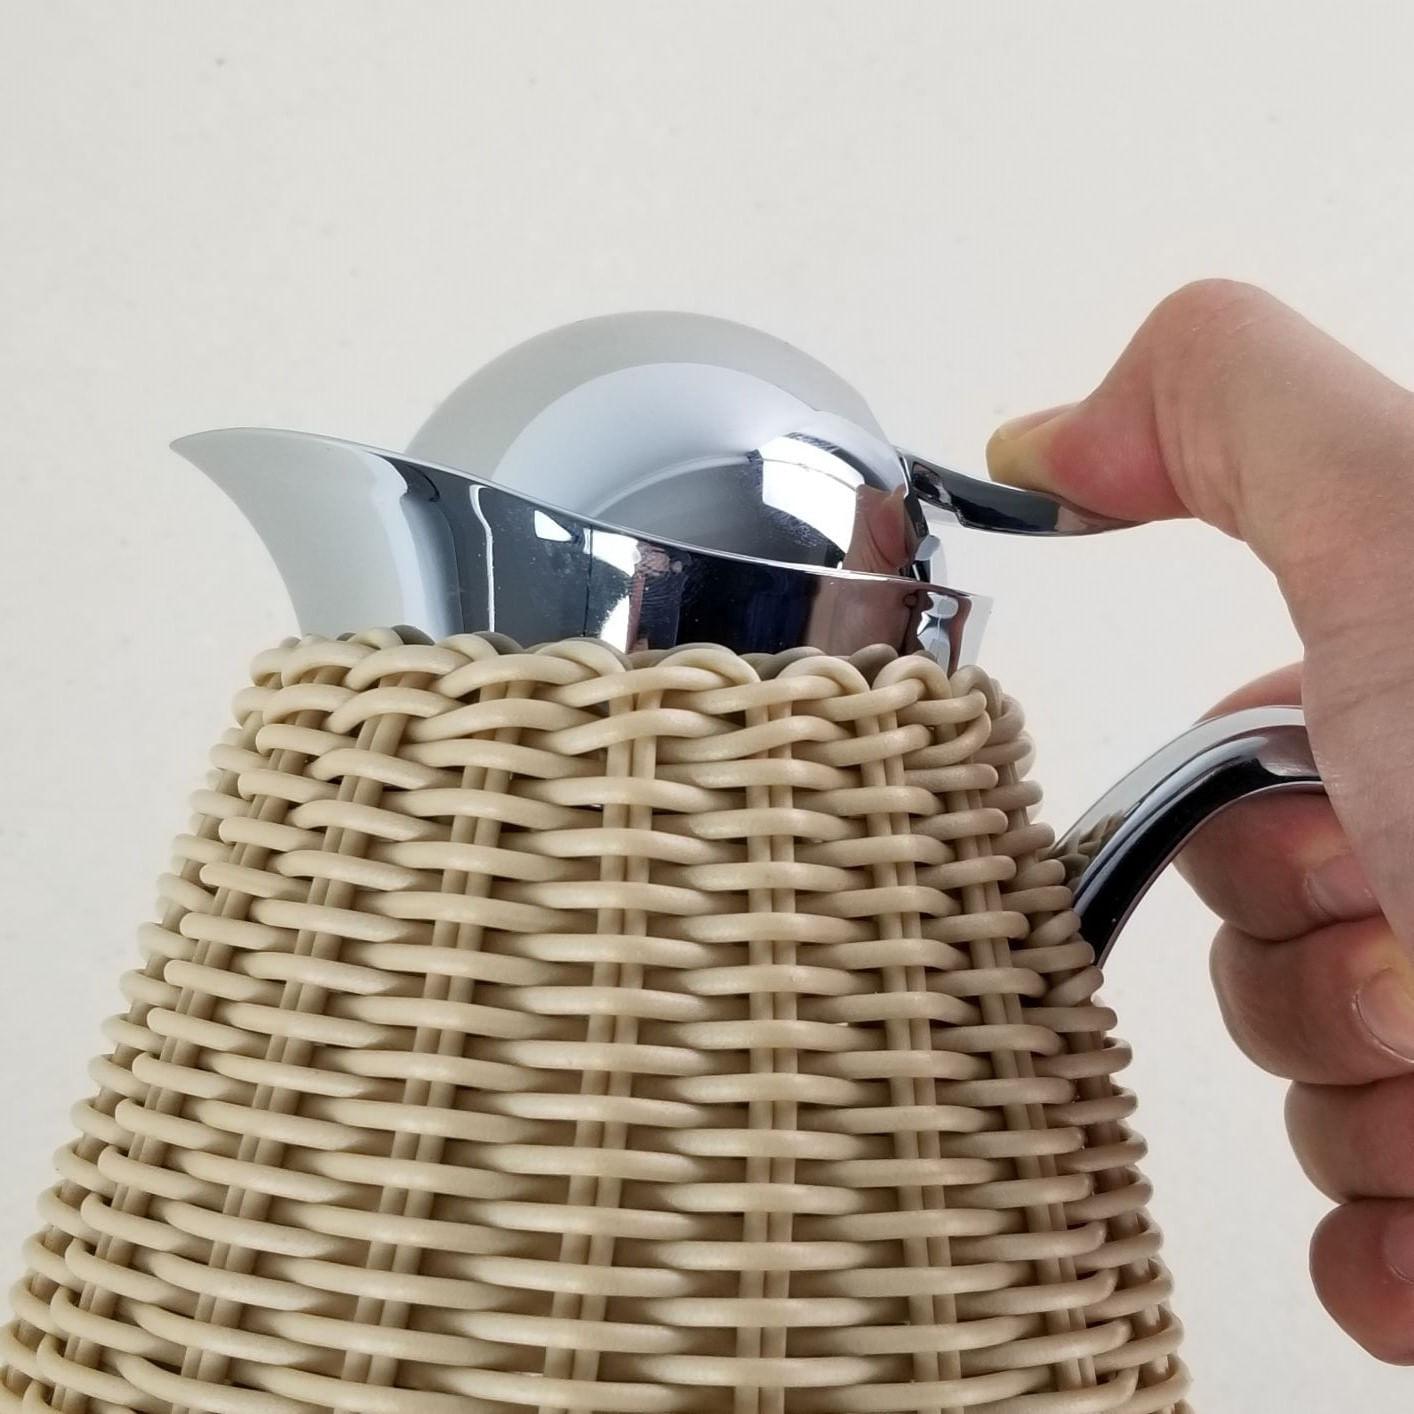 Garrafa Térmica de Inox - Treliça de Rattan Bege Palha Claro